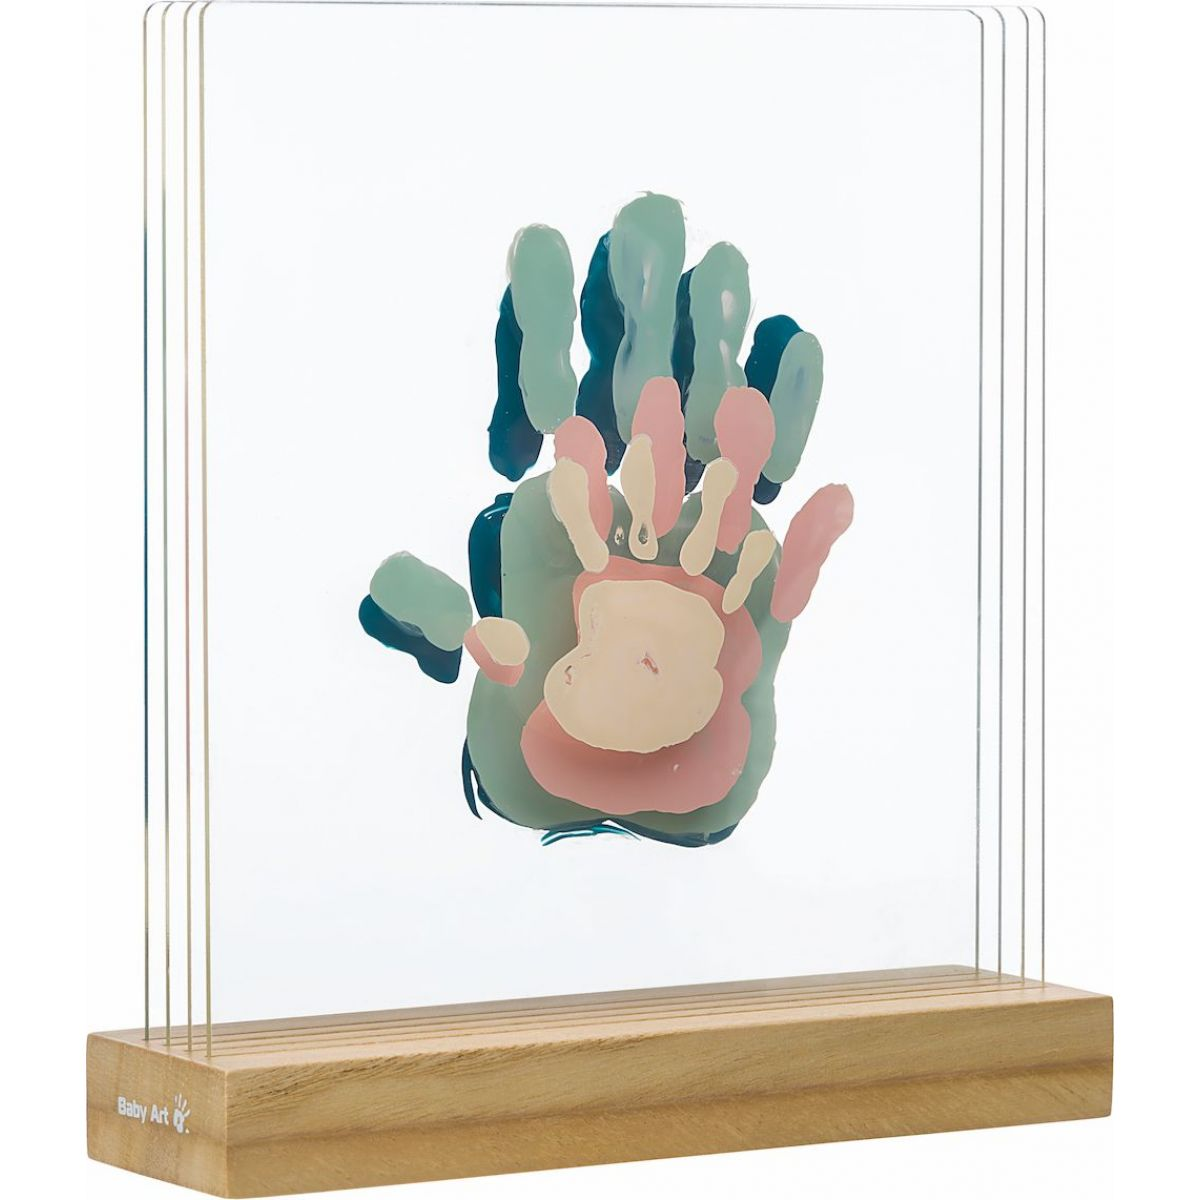 Baby Art Family Prints Wooden